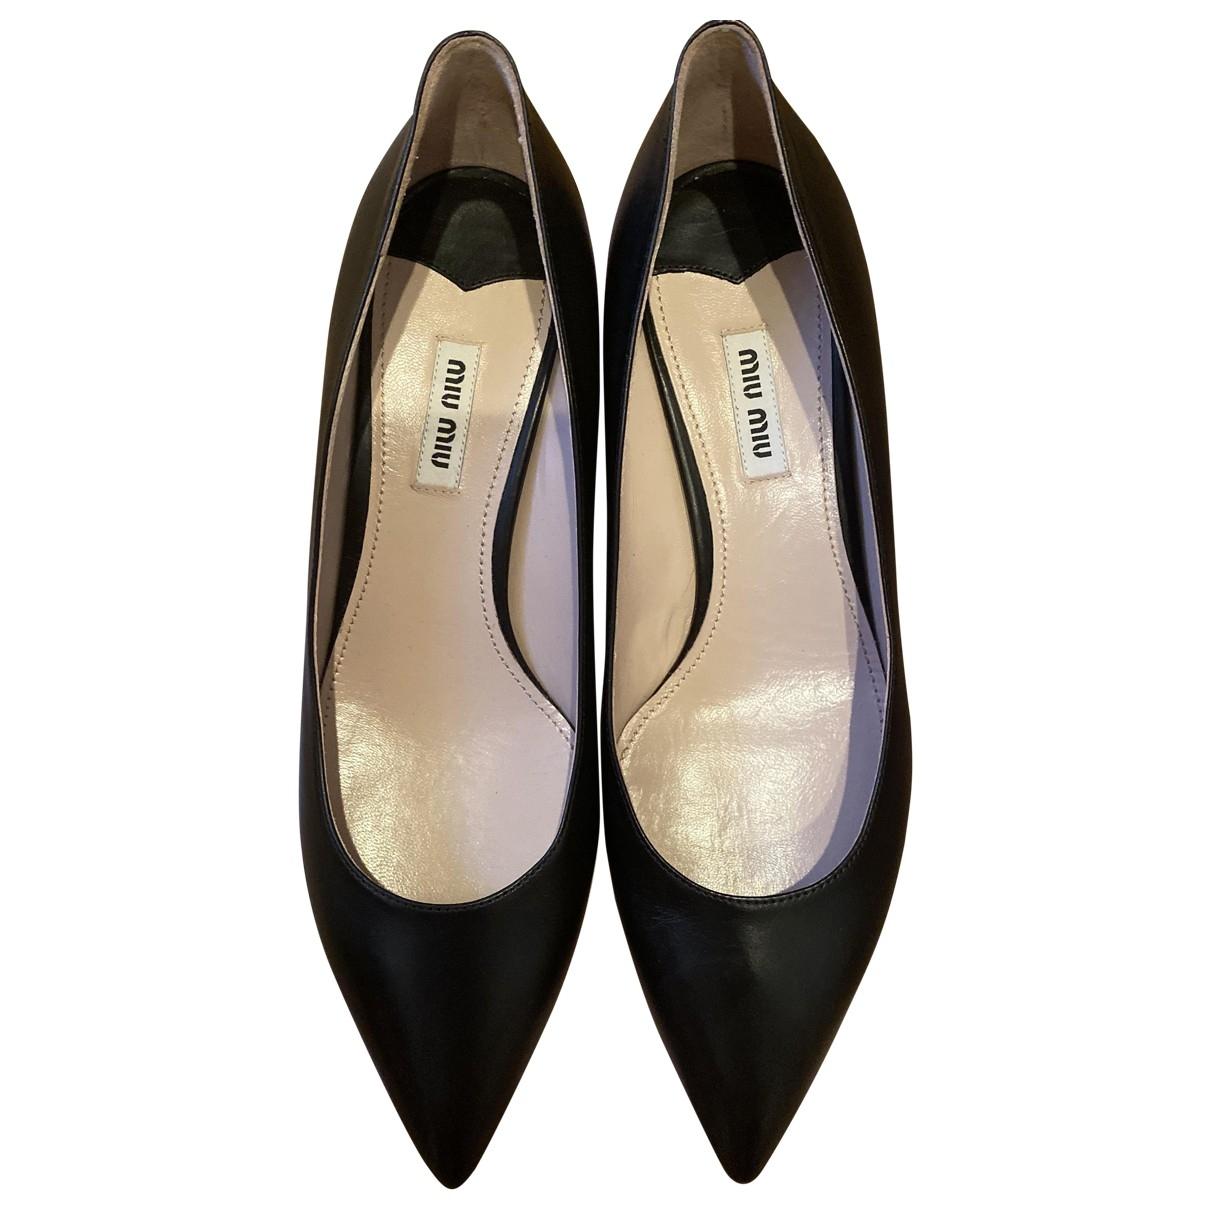 Miu Miu \N Black Leather Heels for Women 40 EU